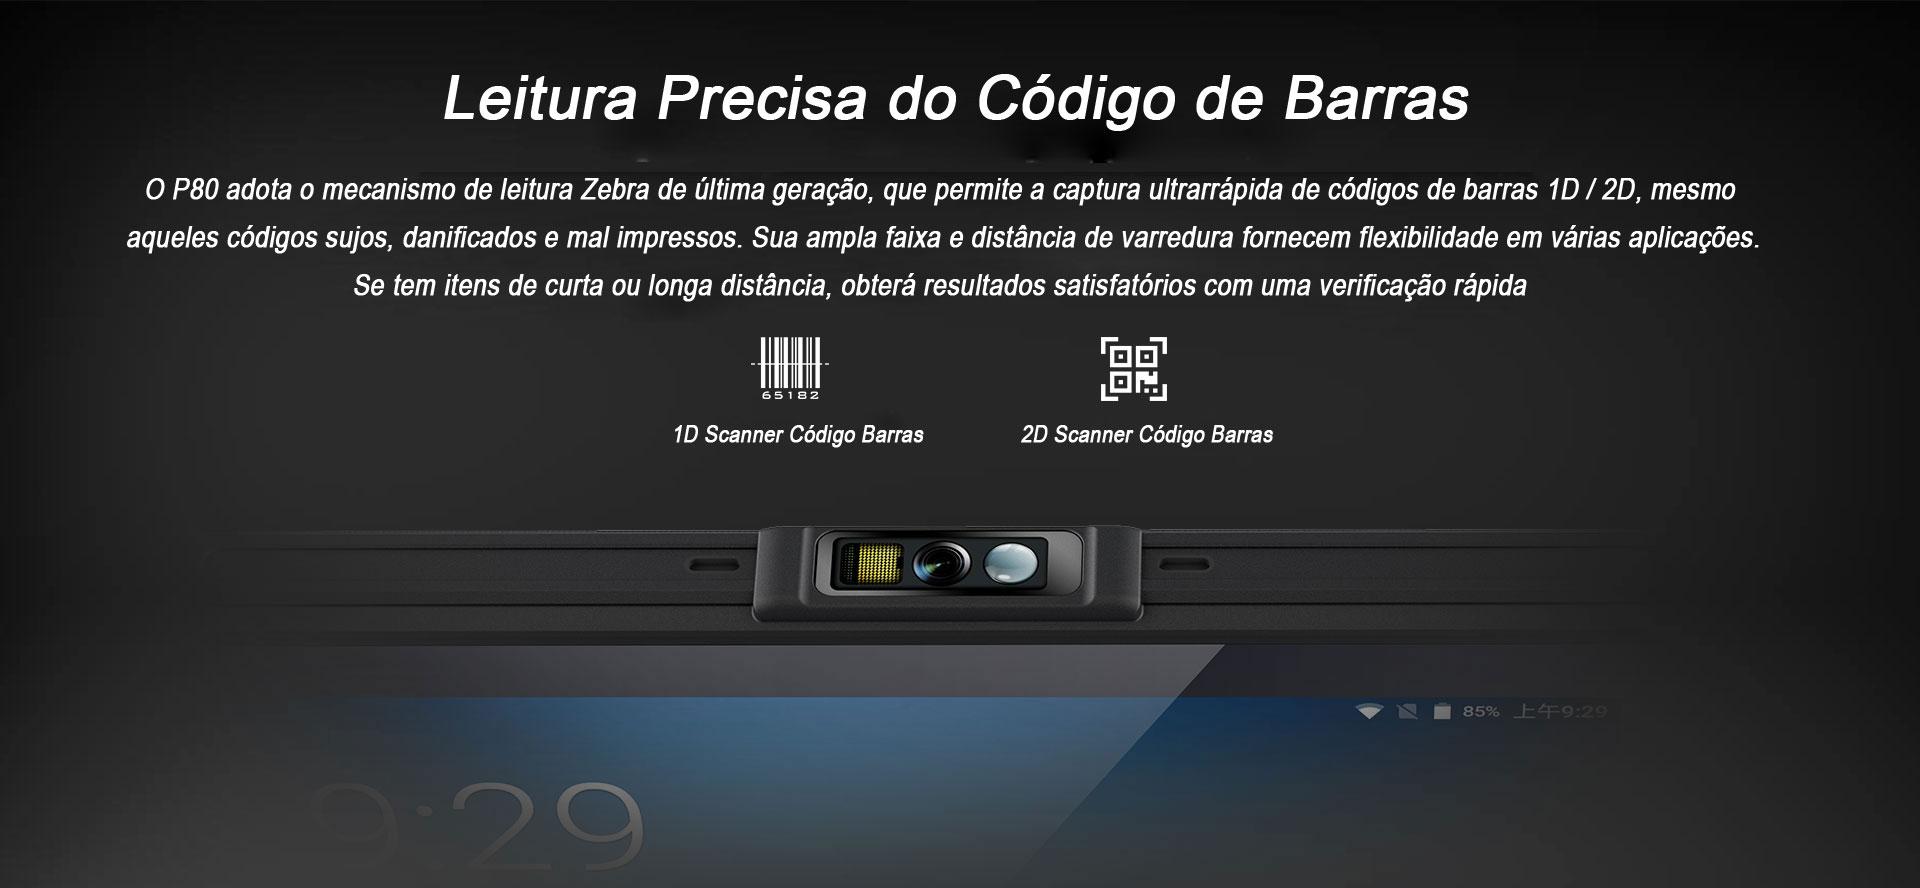 Tablet Industrial P80 Chainway Android Codigo do Barras